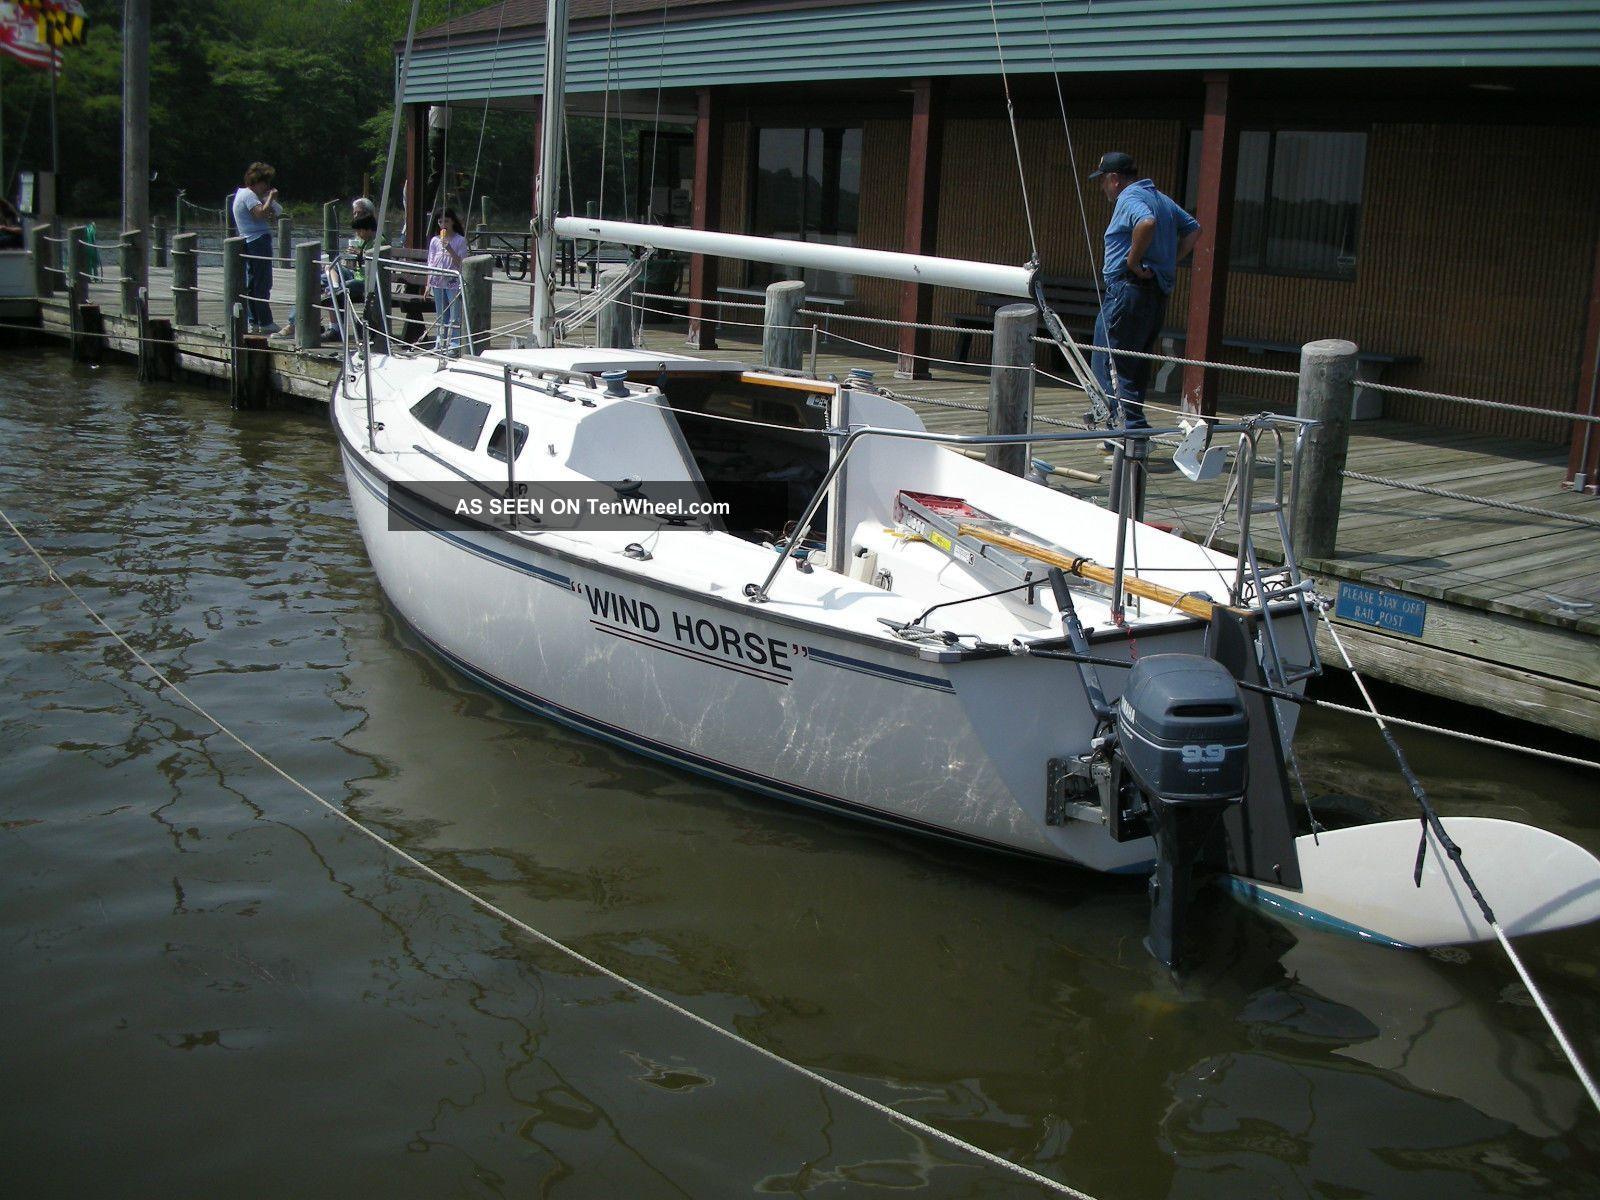 1993 Precision Sailboats 20-27 feet photo